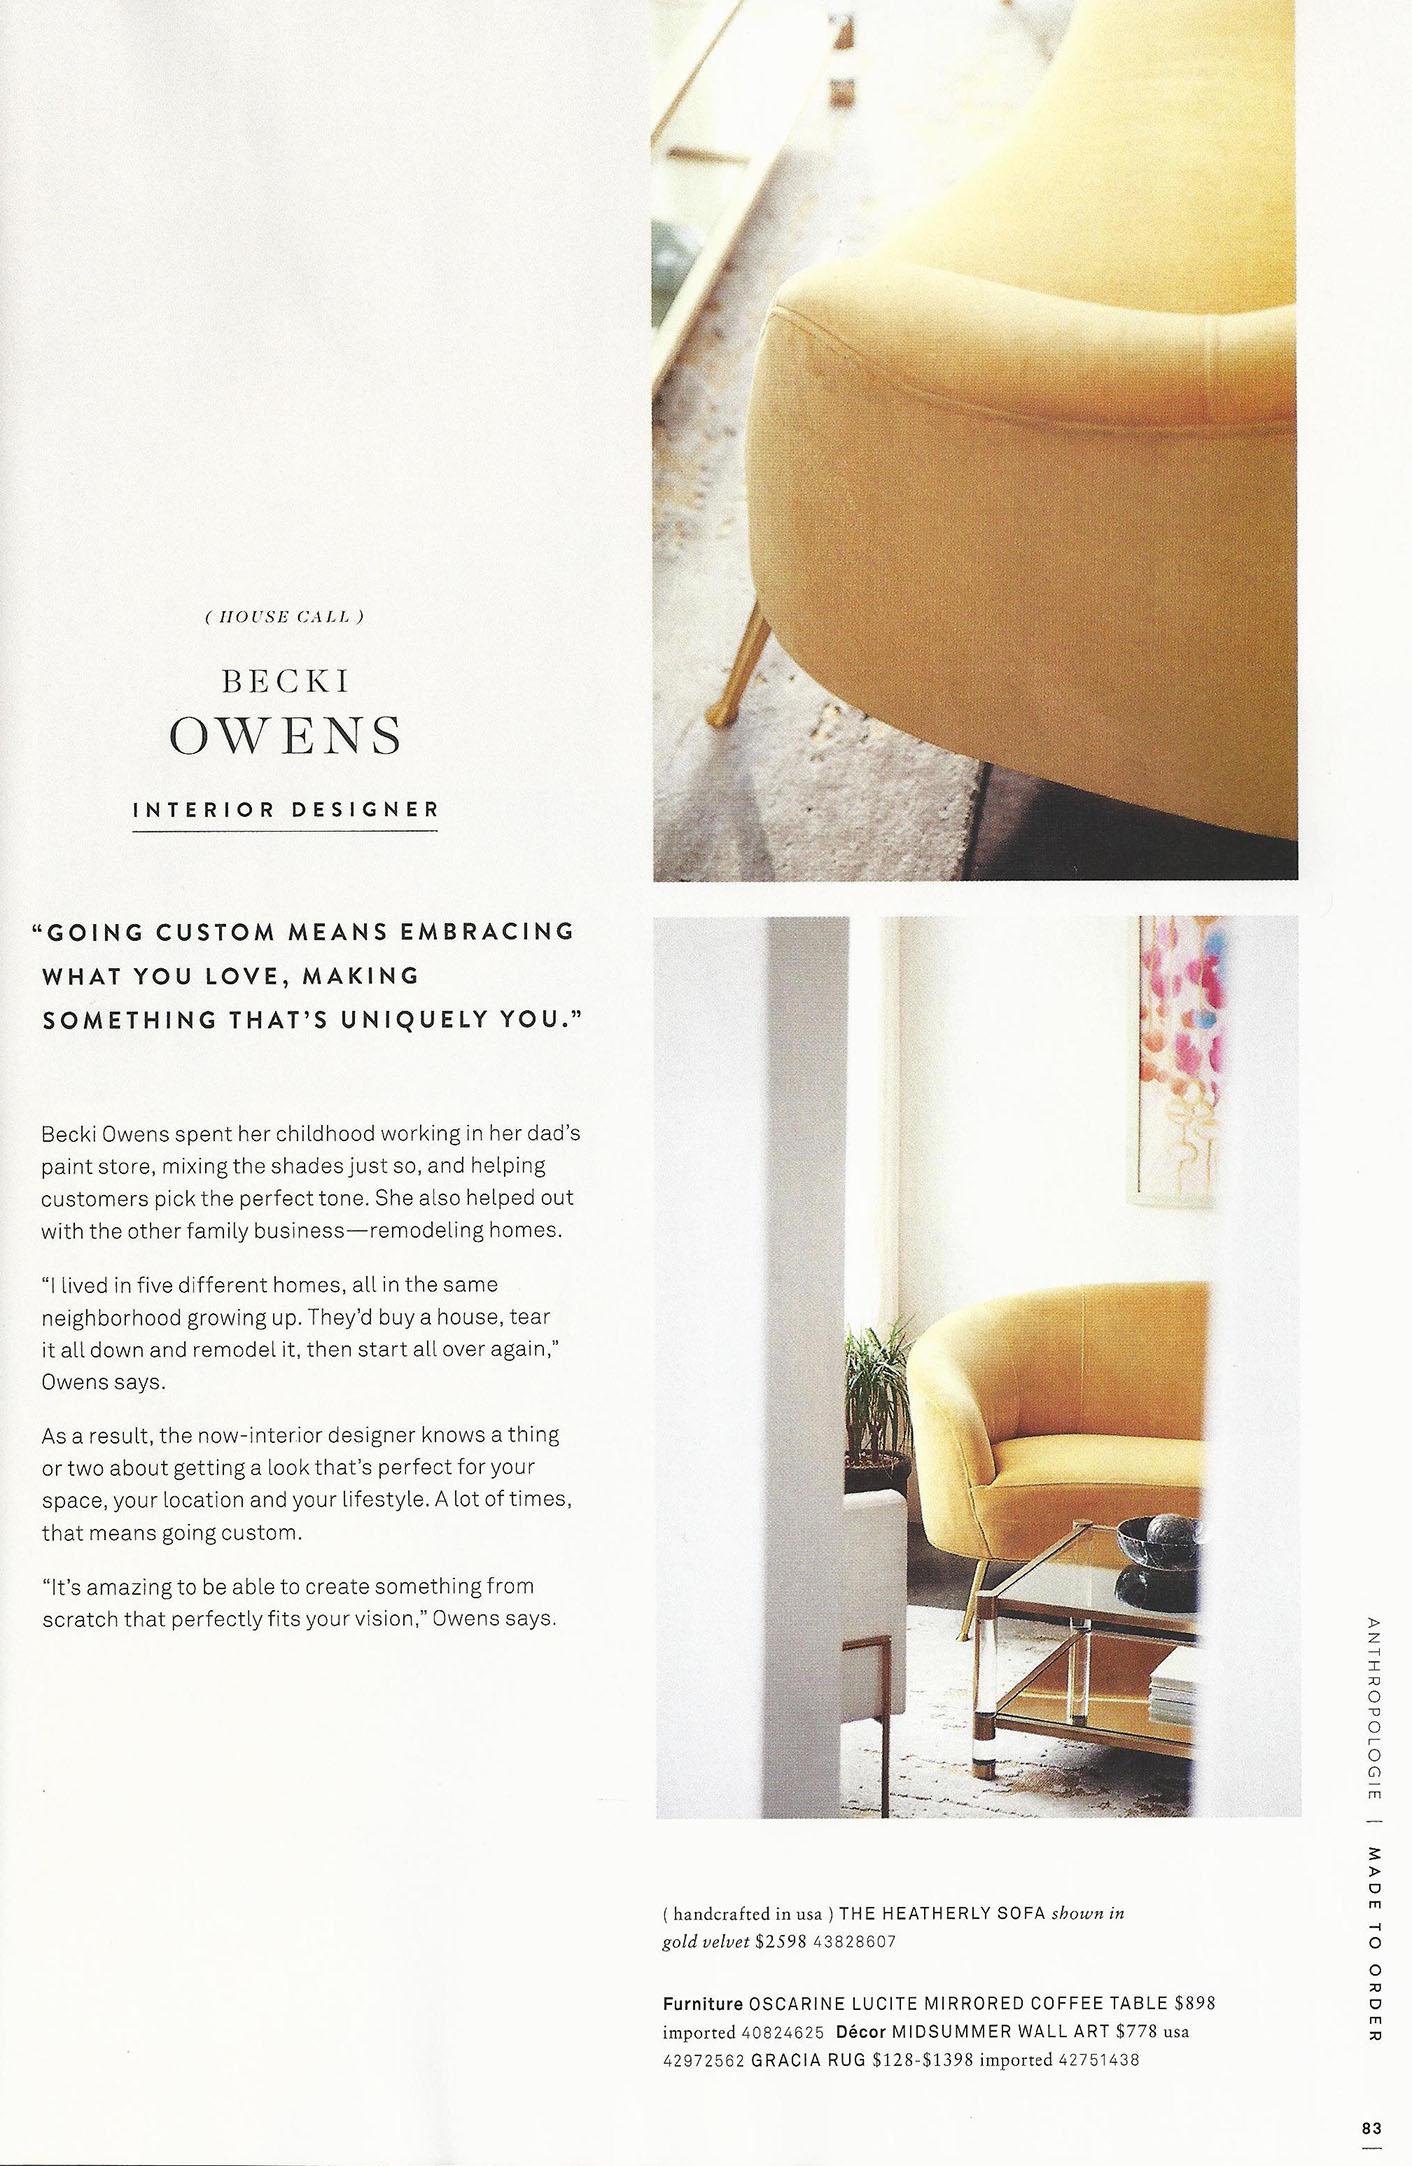 Anthropologie Home '17 Mailer - Lifestyle Marketing